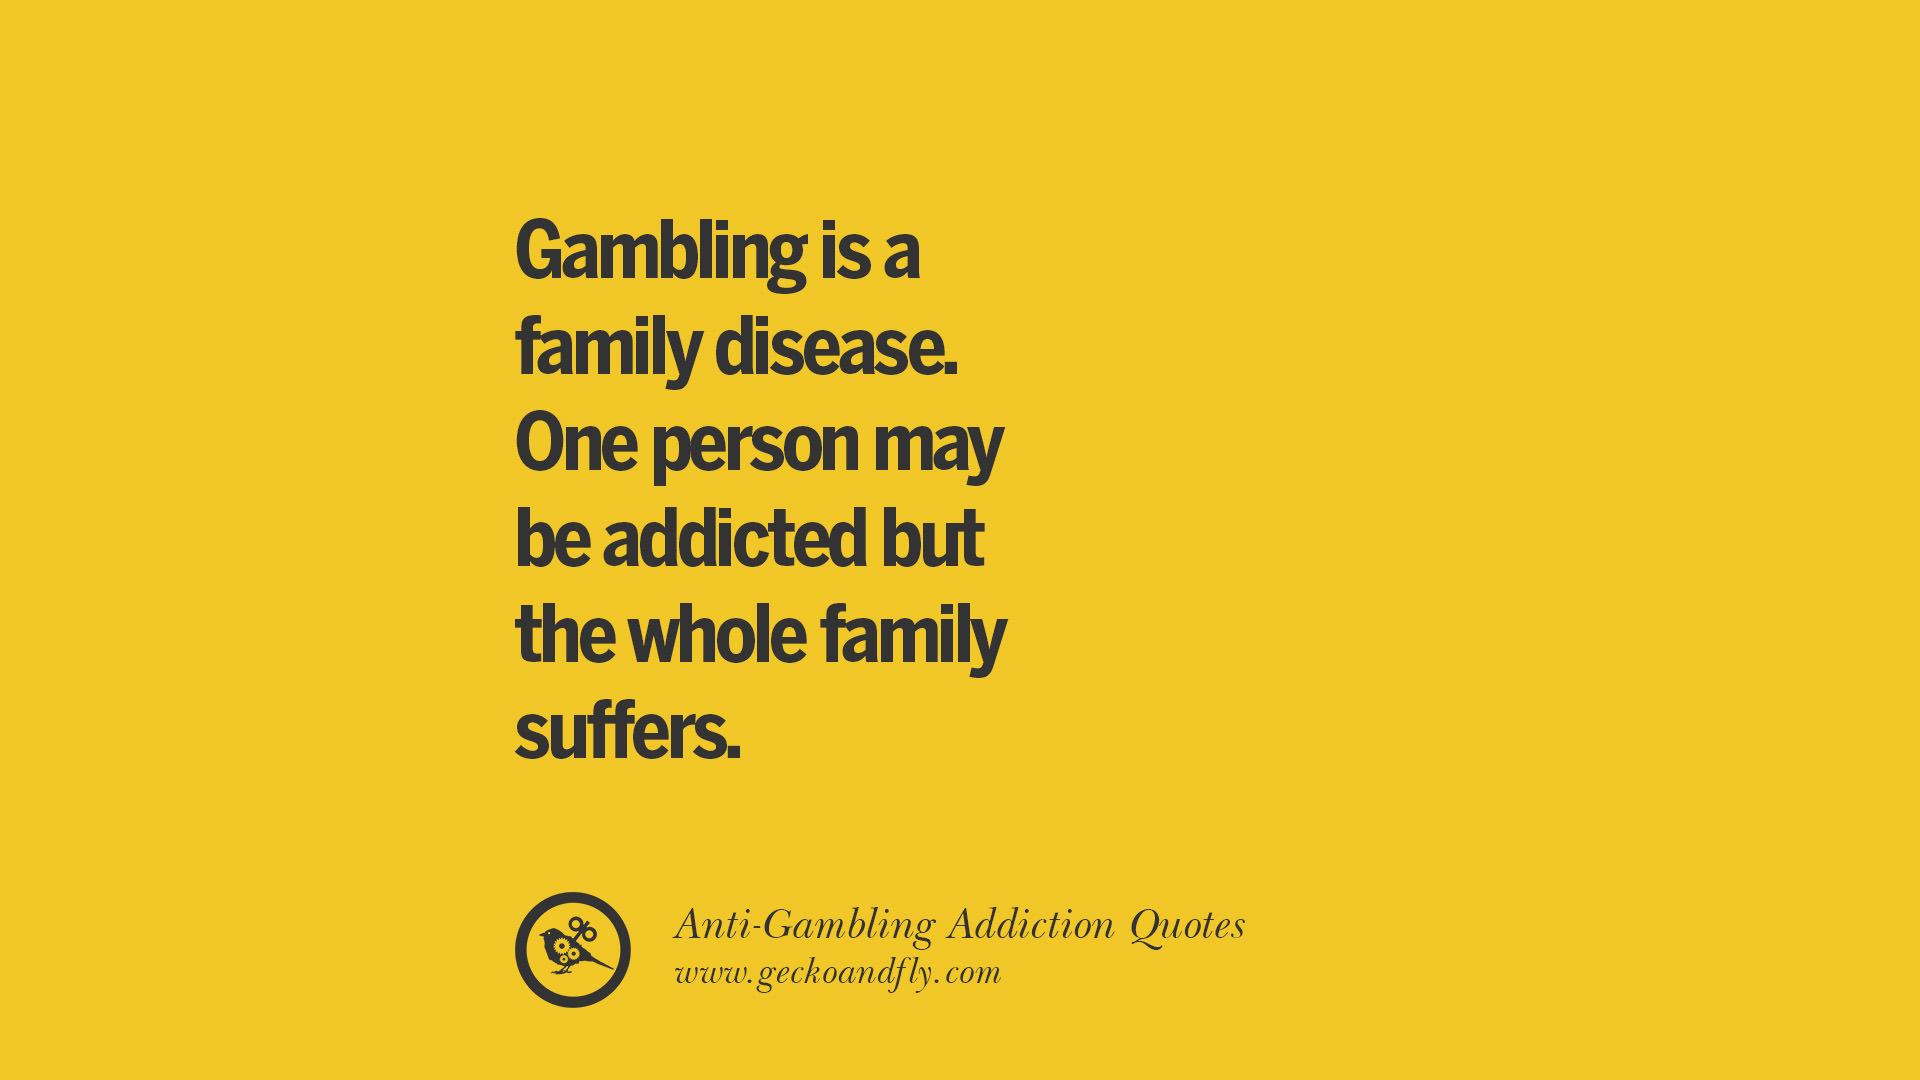 Gambling Addiction Quotes